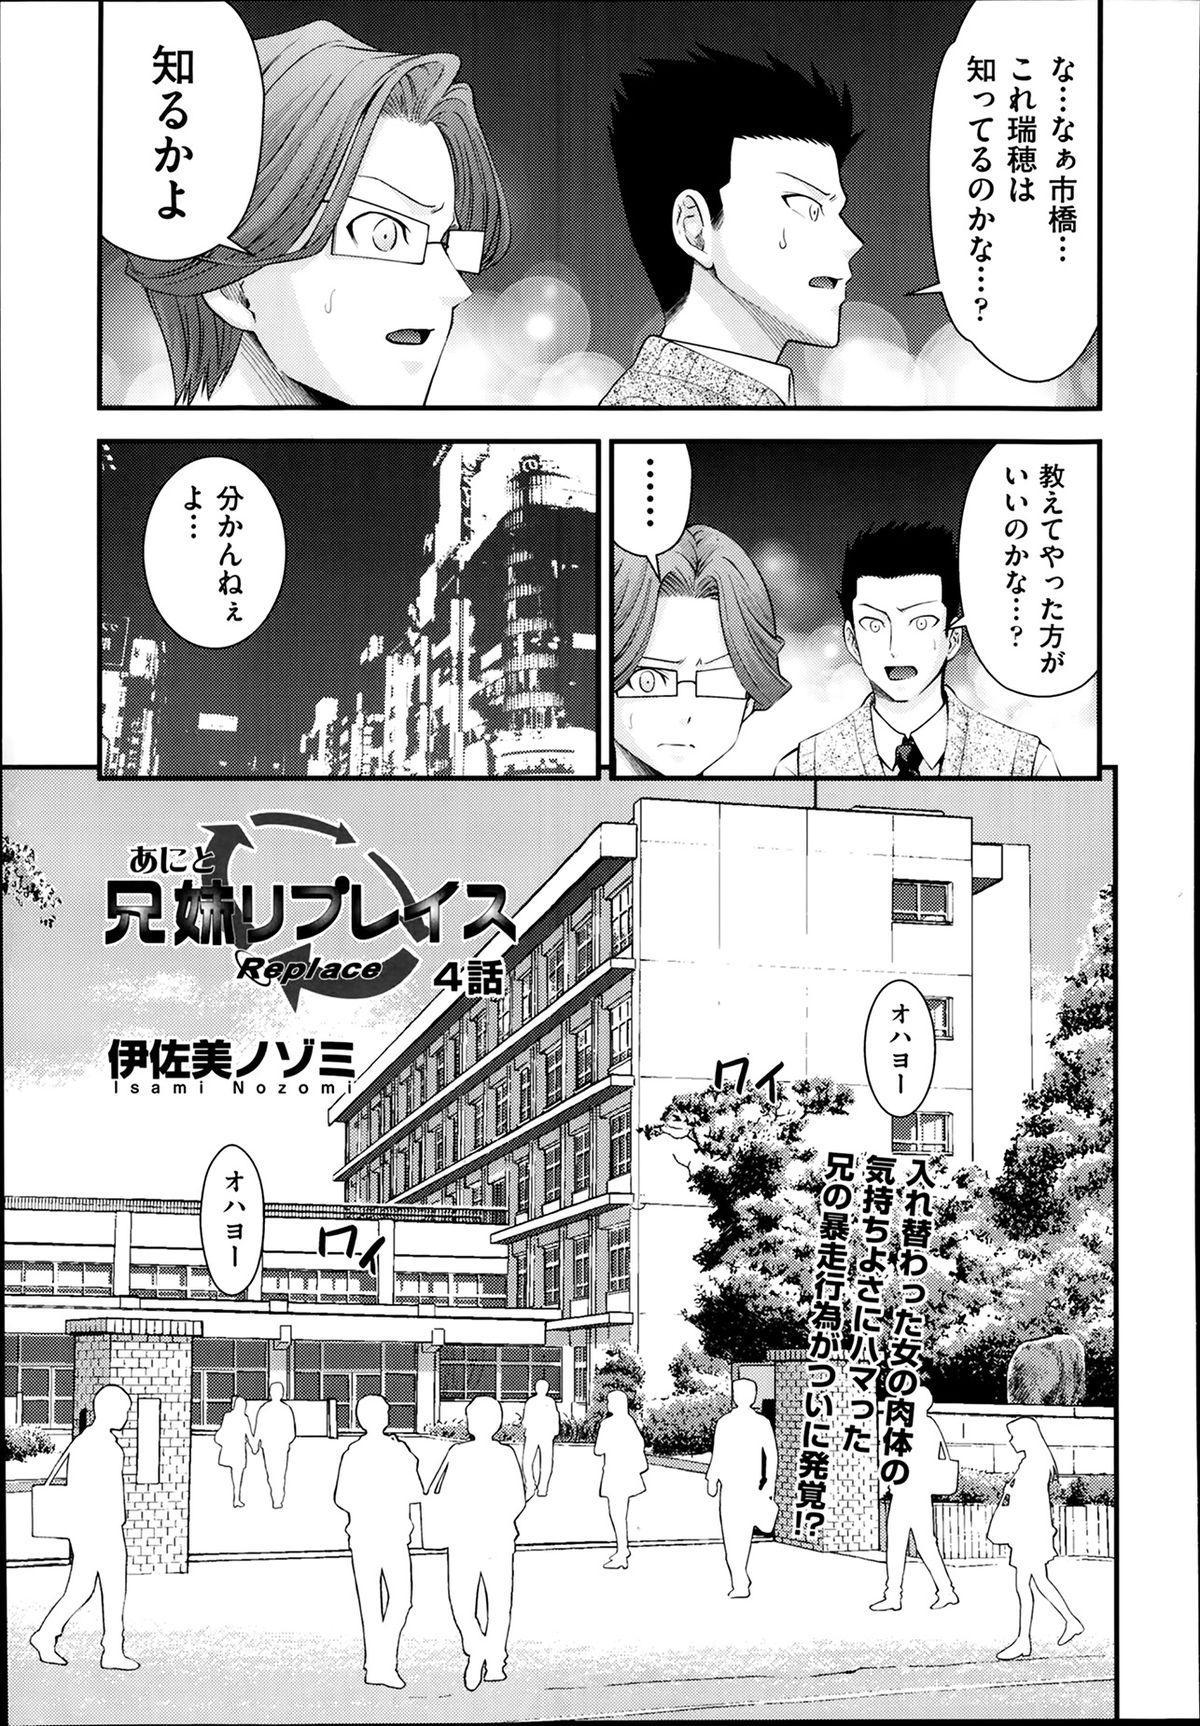 Kyoudai Replace 72